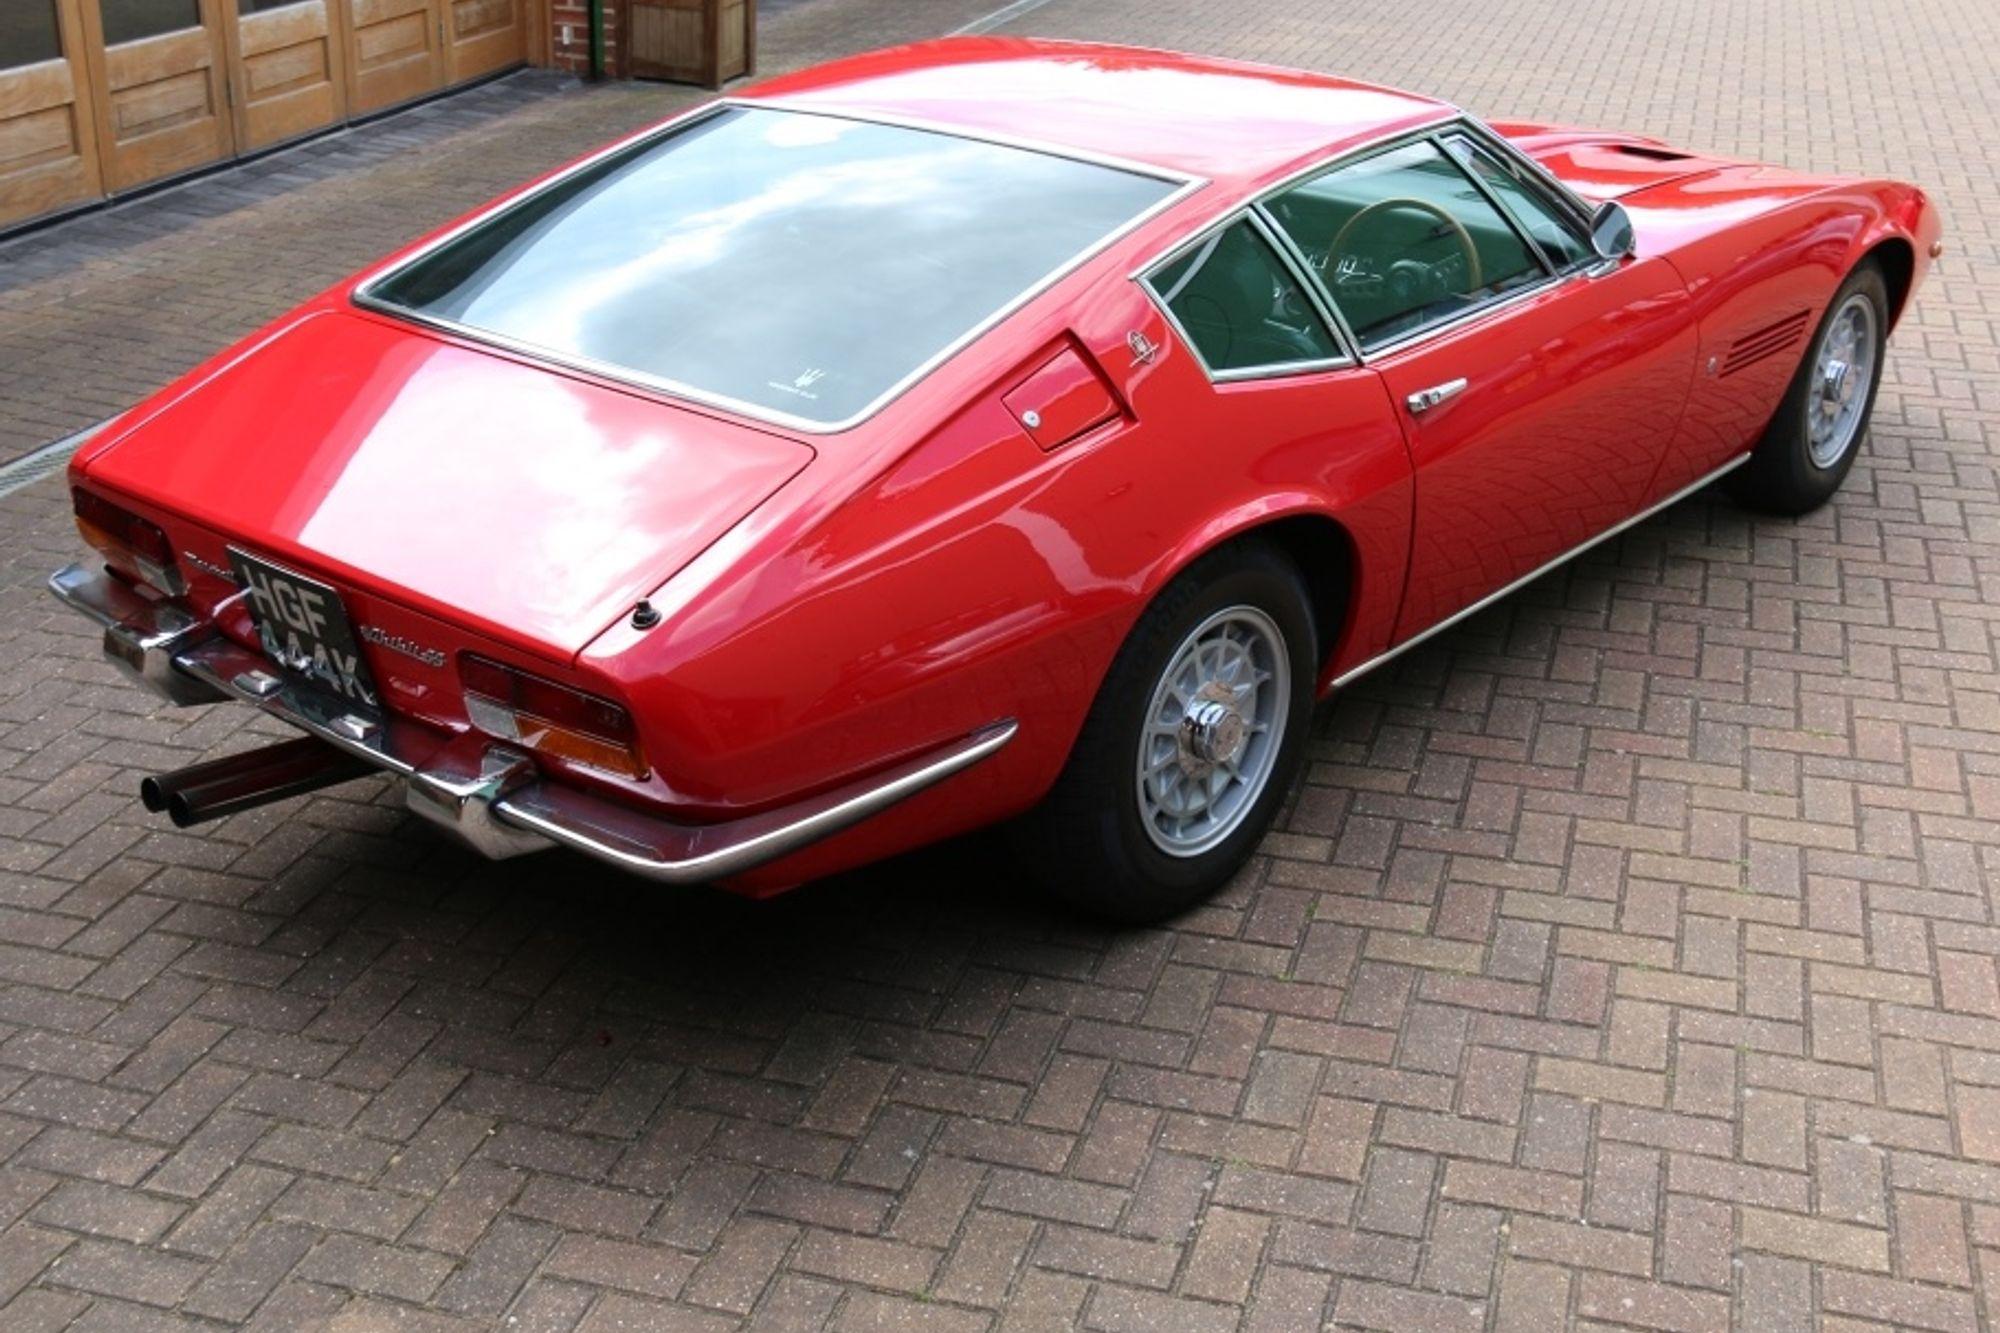 1972 Maserati Ghibli SS RHD | Sold | Woodham Mortimer